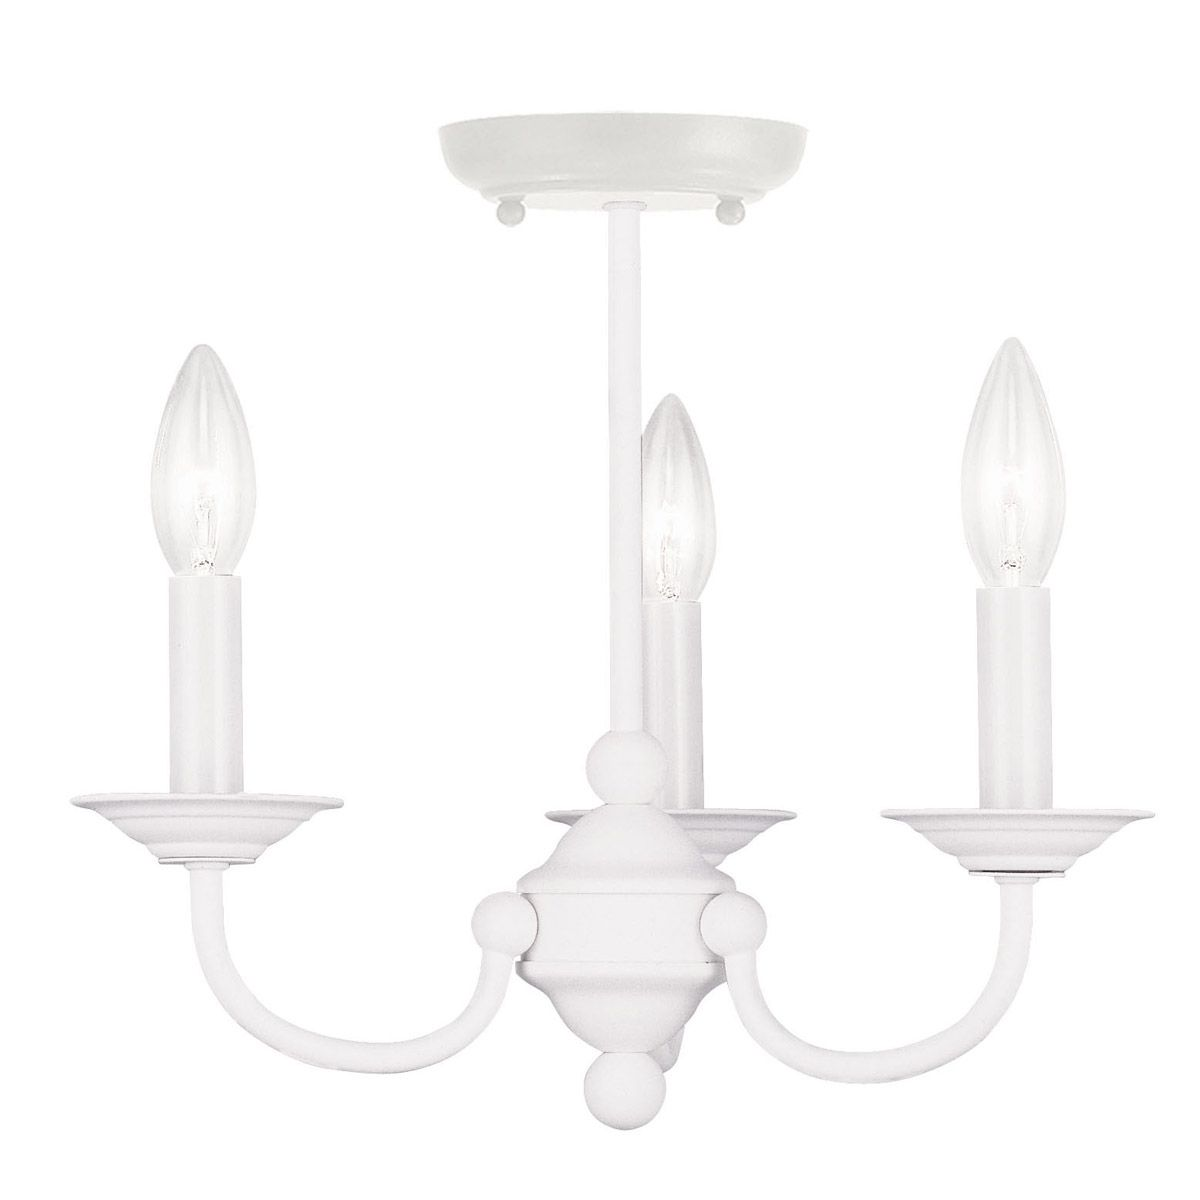 Livex 4153 03 home basics 3 light 14 inch white mini chandelier livex 4153 03 home basics 3 light 14 inch white mini chandelier ceiling light arubaitofo Images